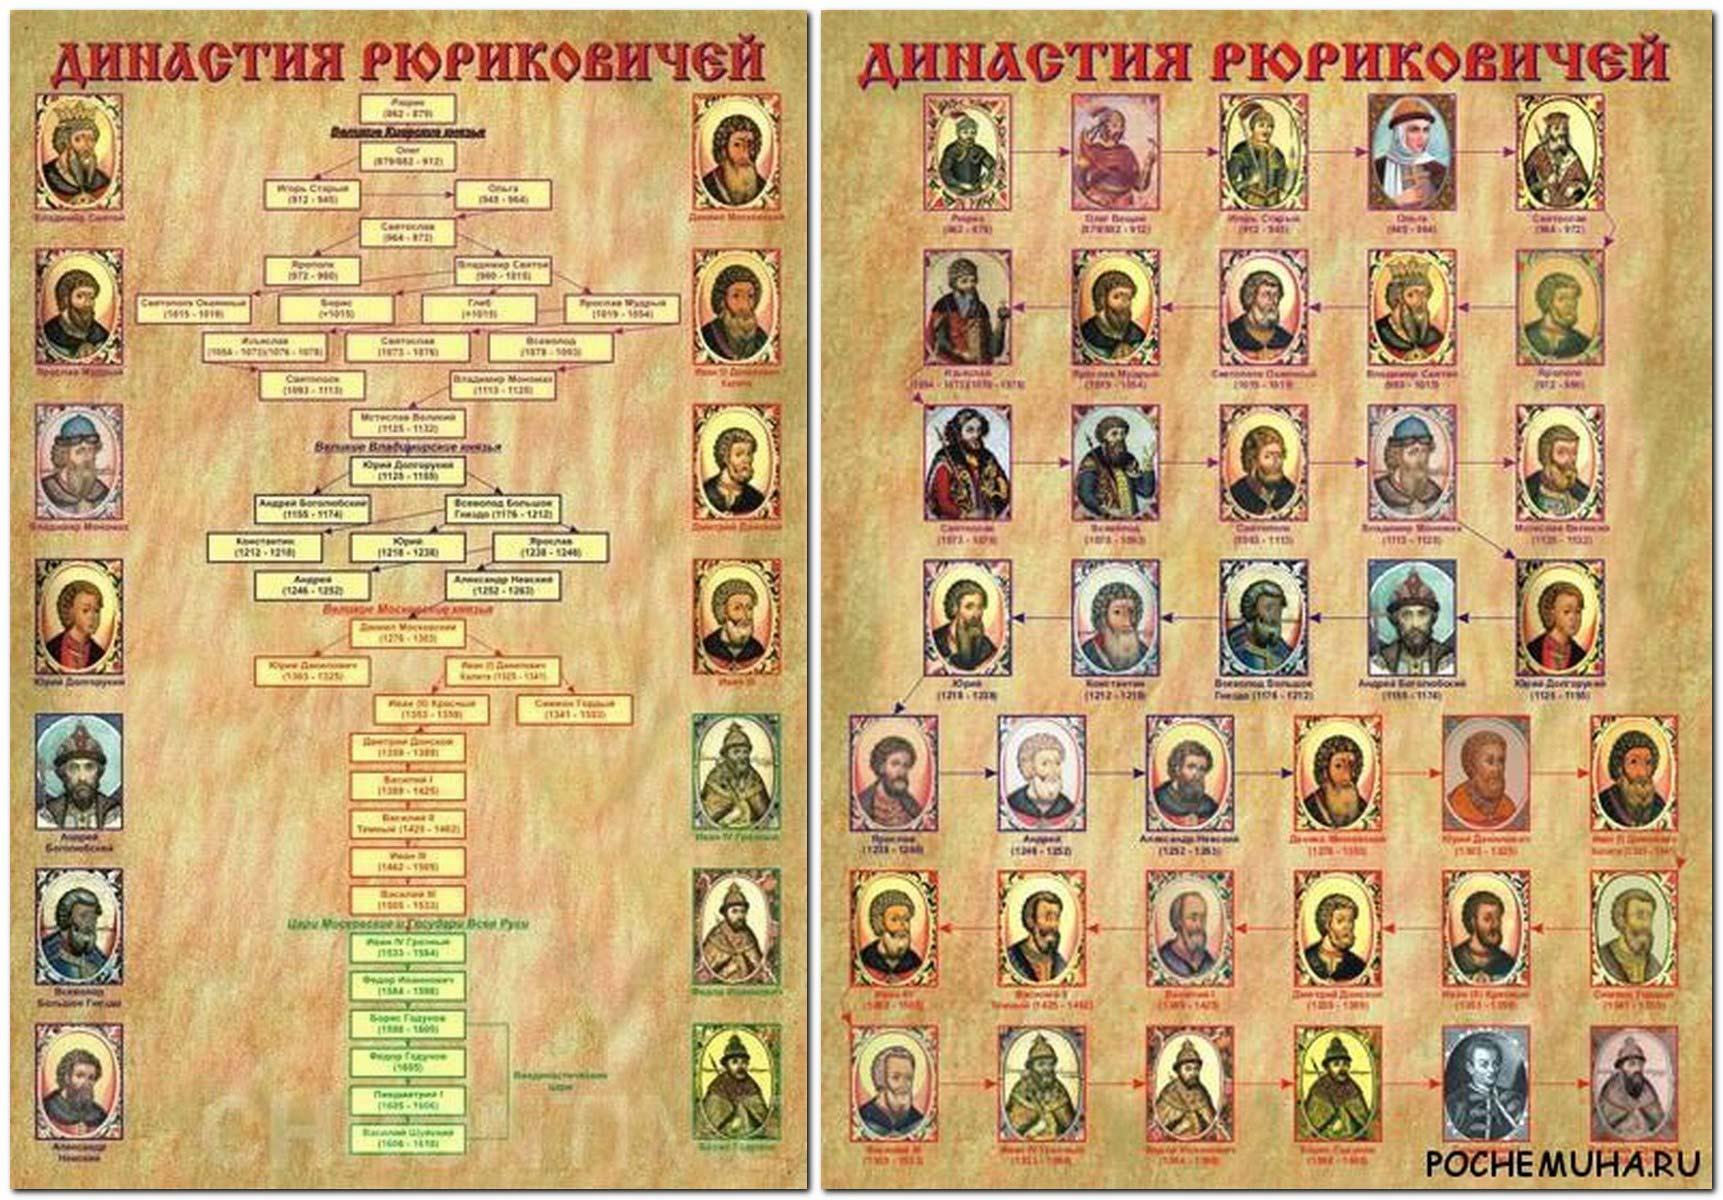 Рисунки цепочки правителей Руси до Ивана Грозного